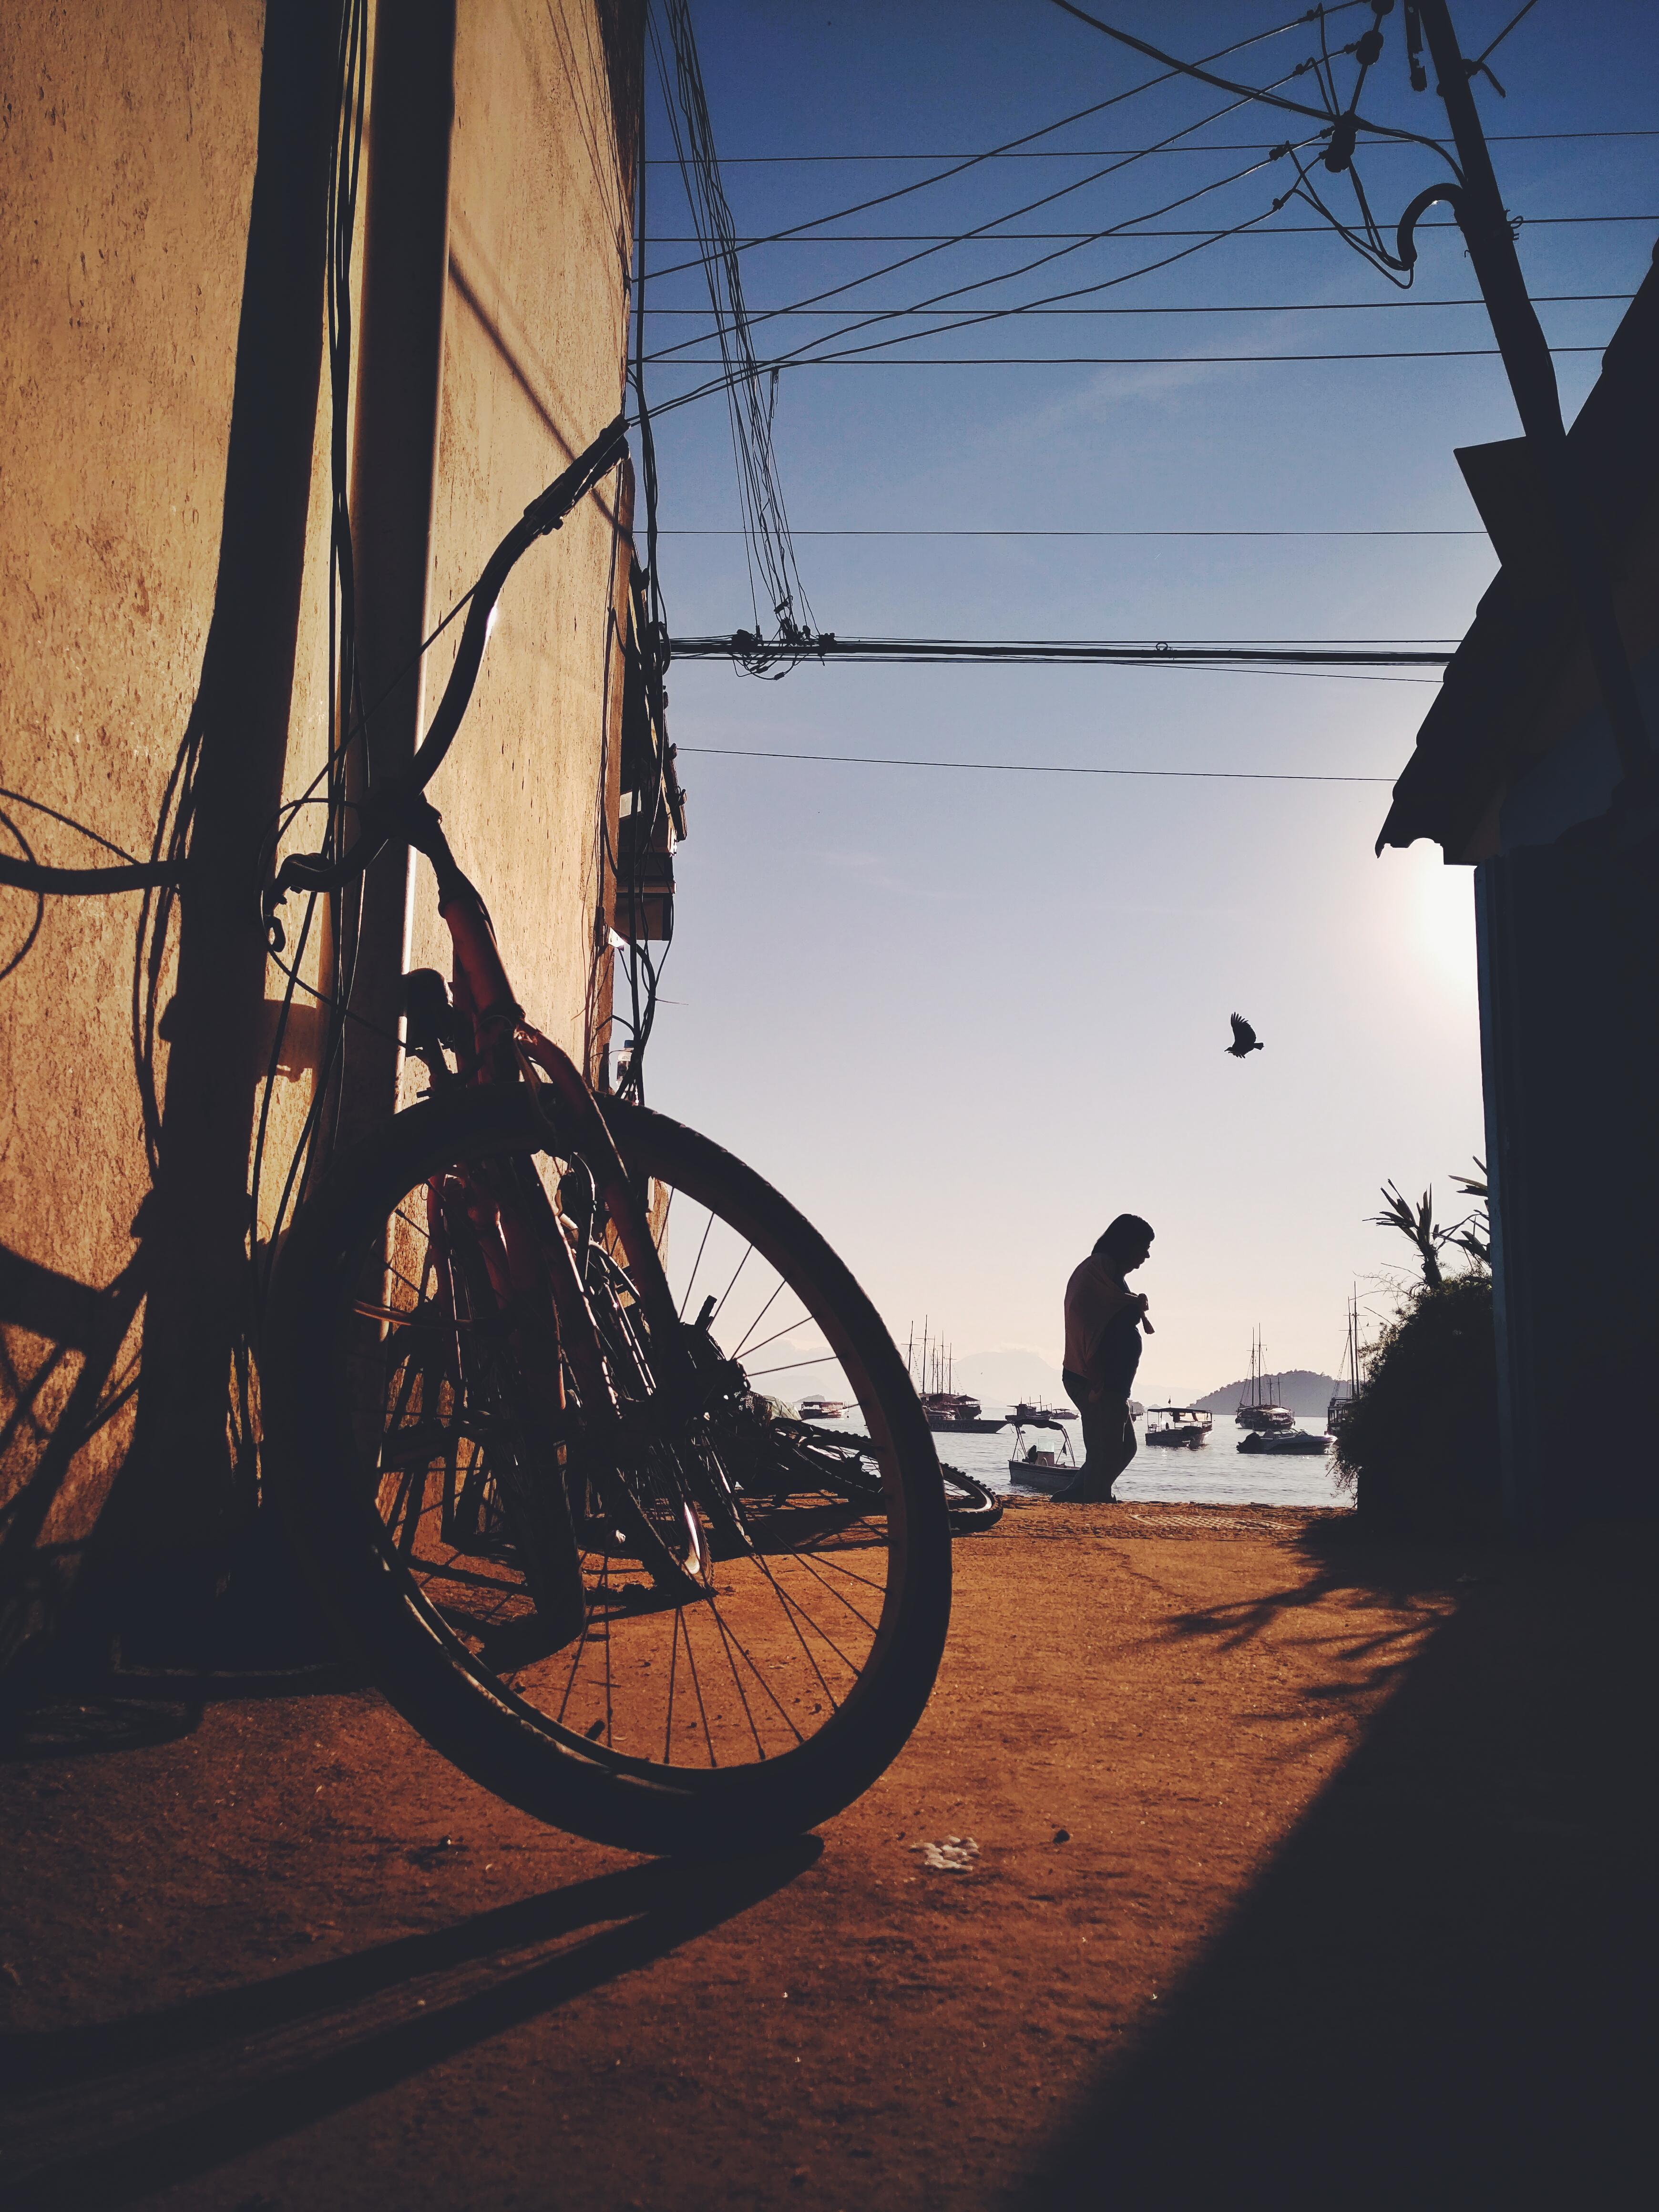 Bike - OnePlus3 - ilha grande.jpg